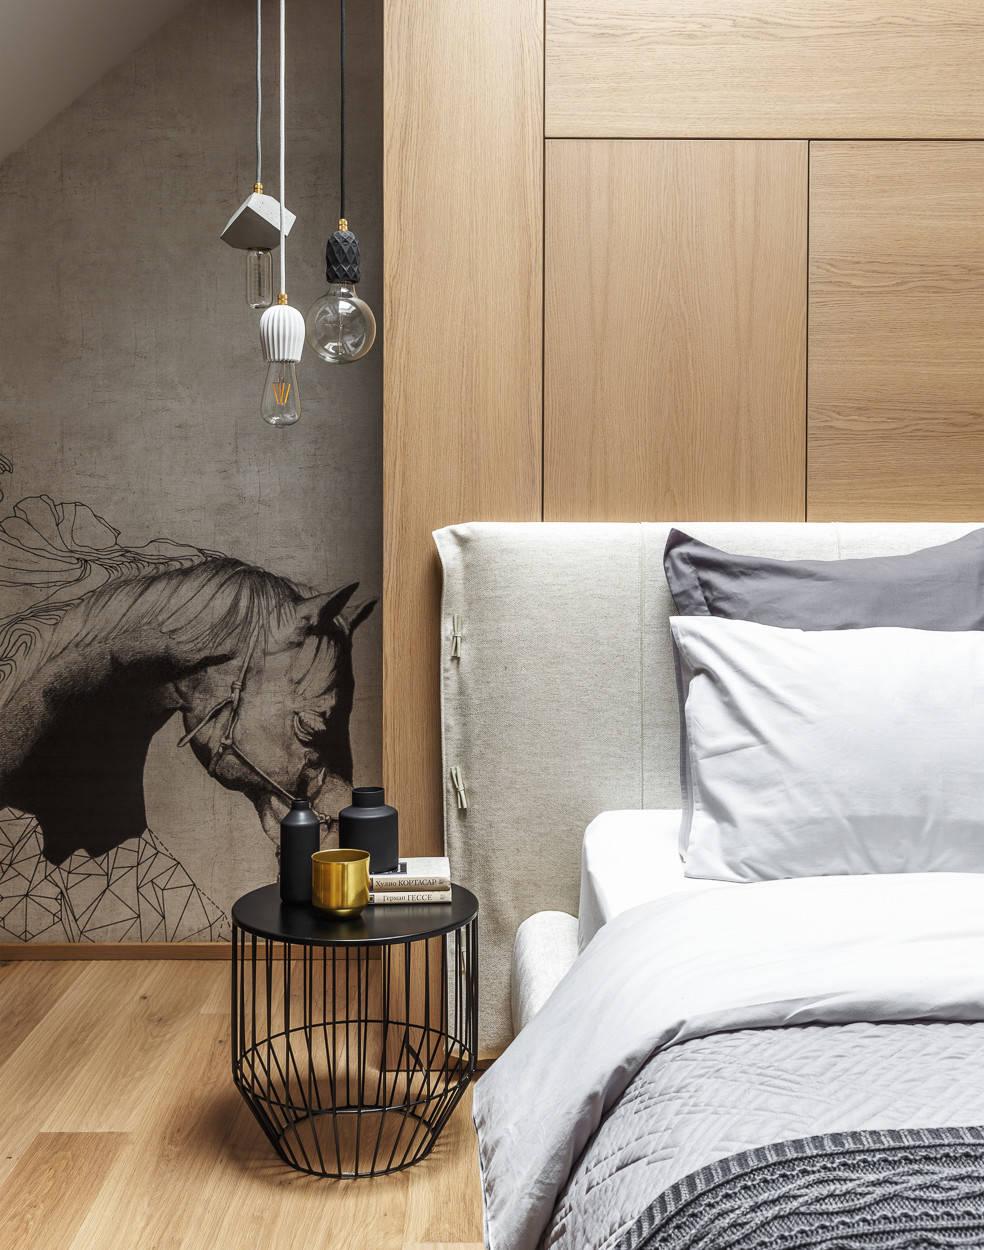 Mooie slaapkamer met houten wandbekleding en behang for Mooie slaapkamer